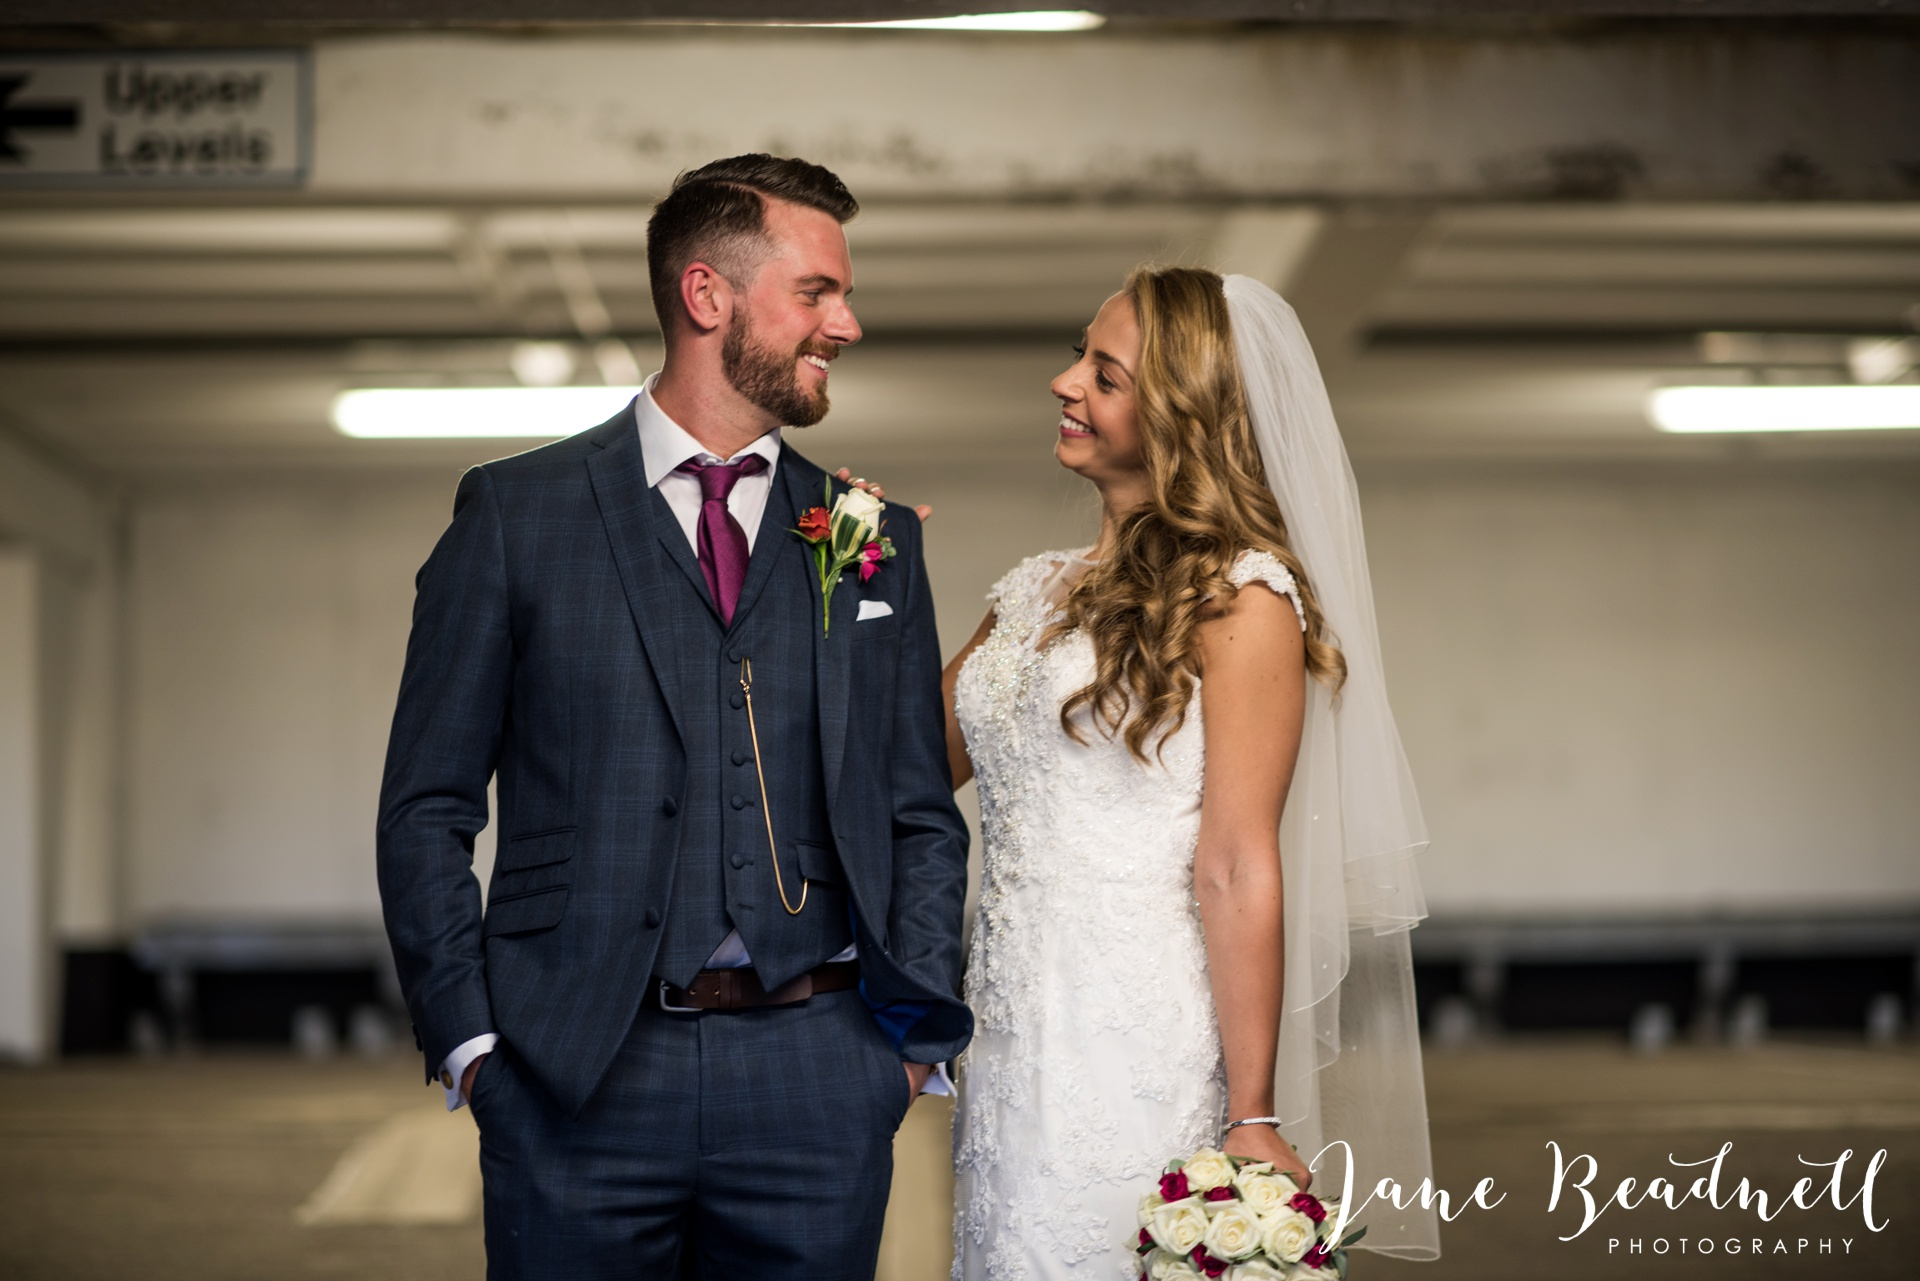 Jane Beadnell fine art wedding photographer Harrogate_0012